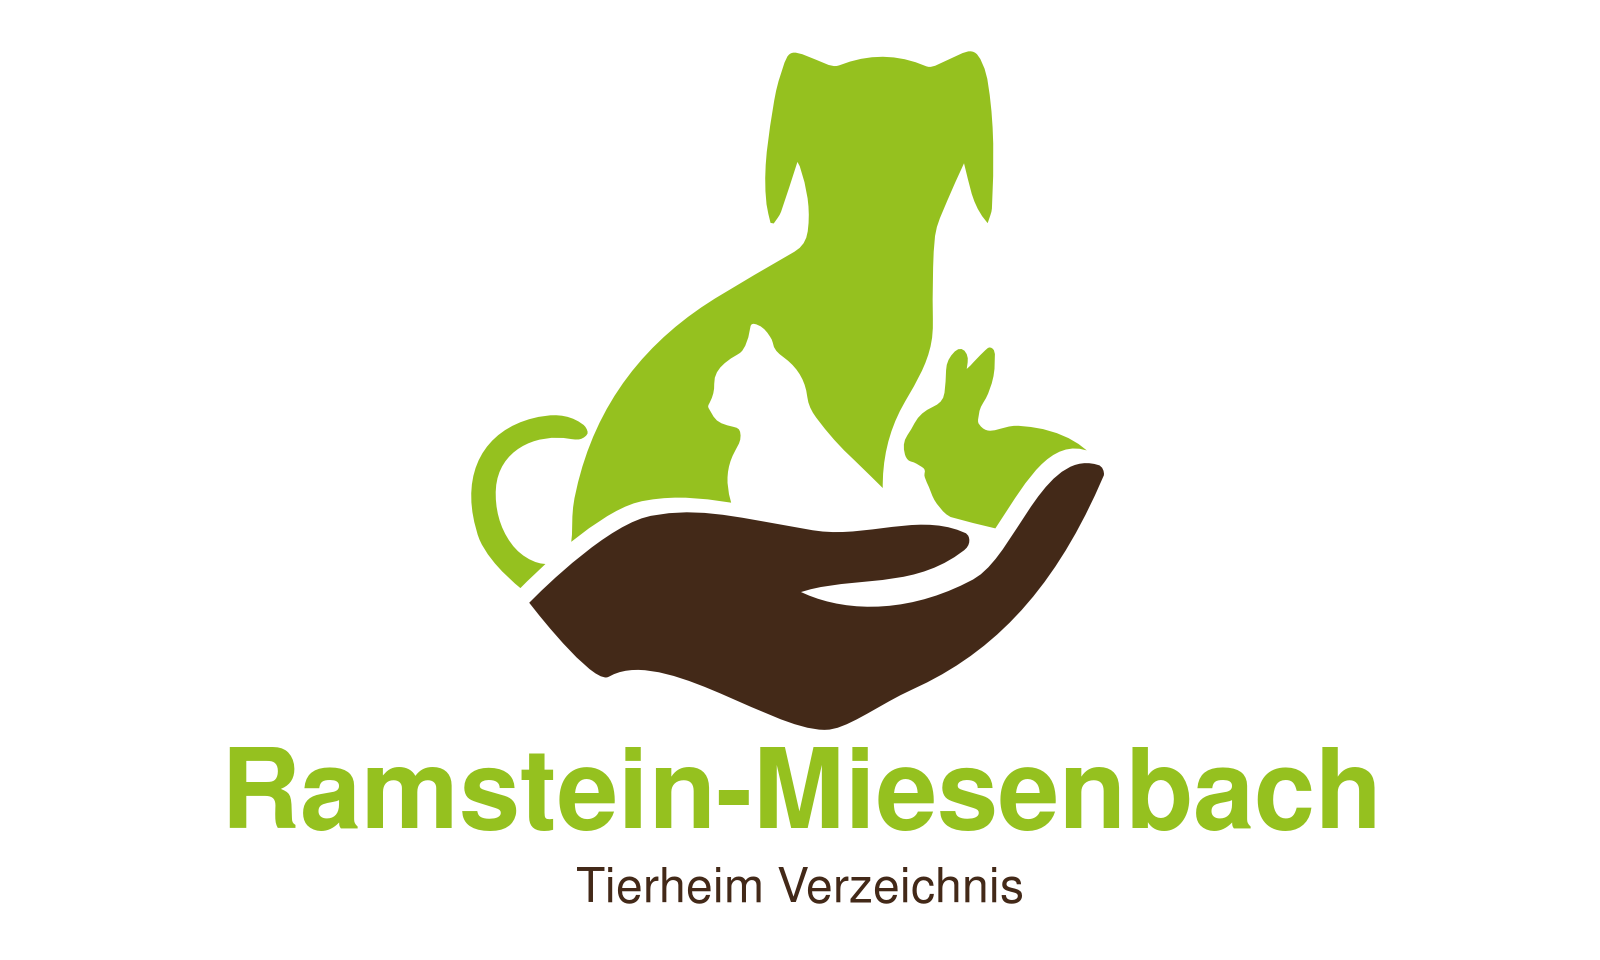 Tierheim Ramstein-Miesenbach